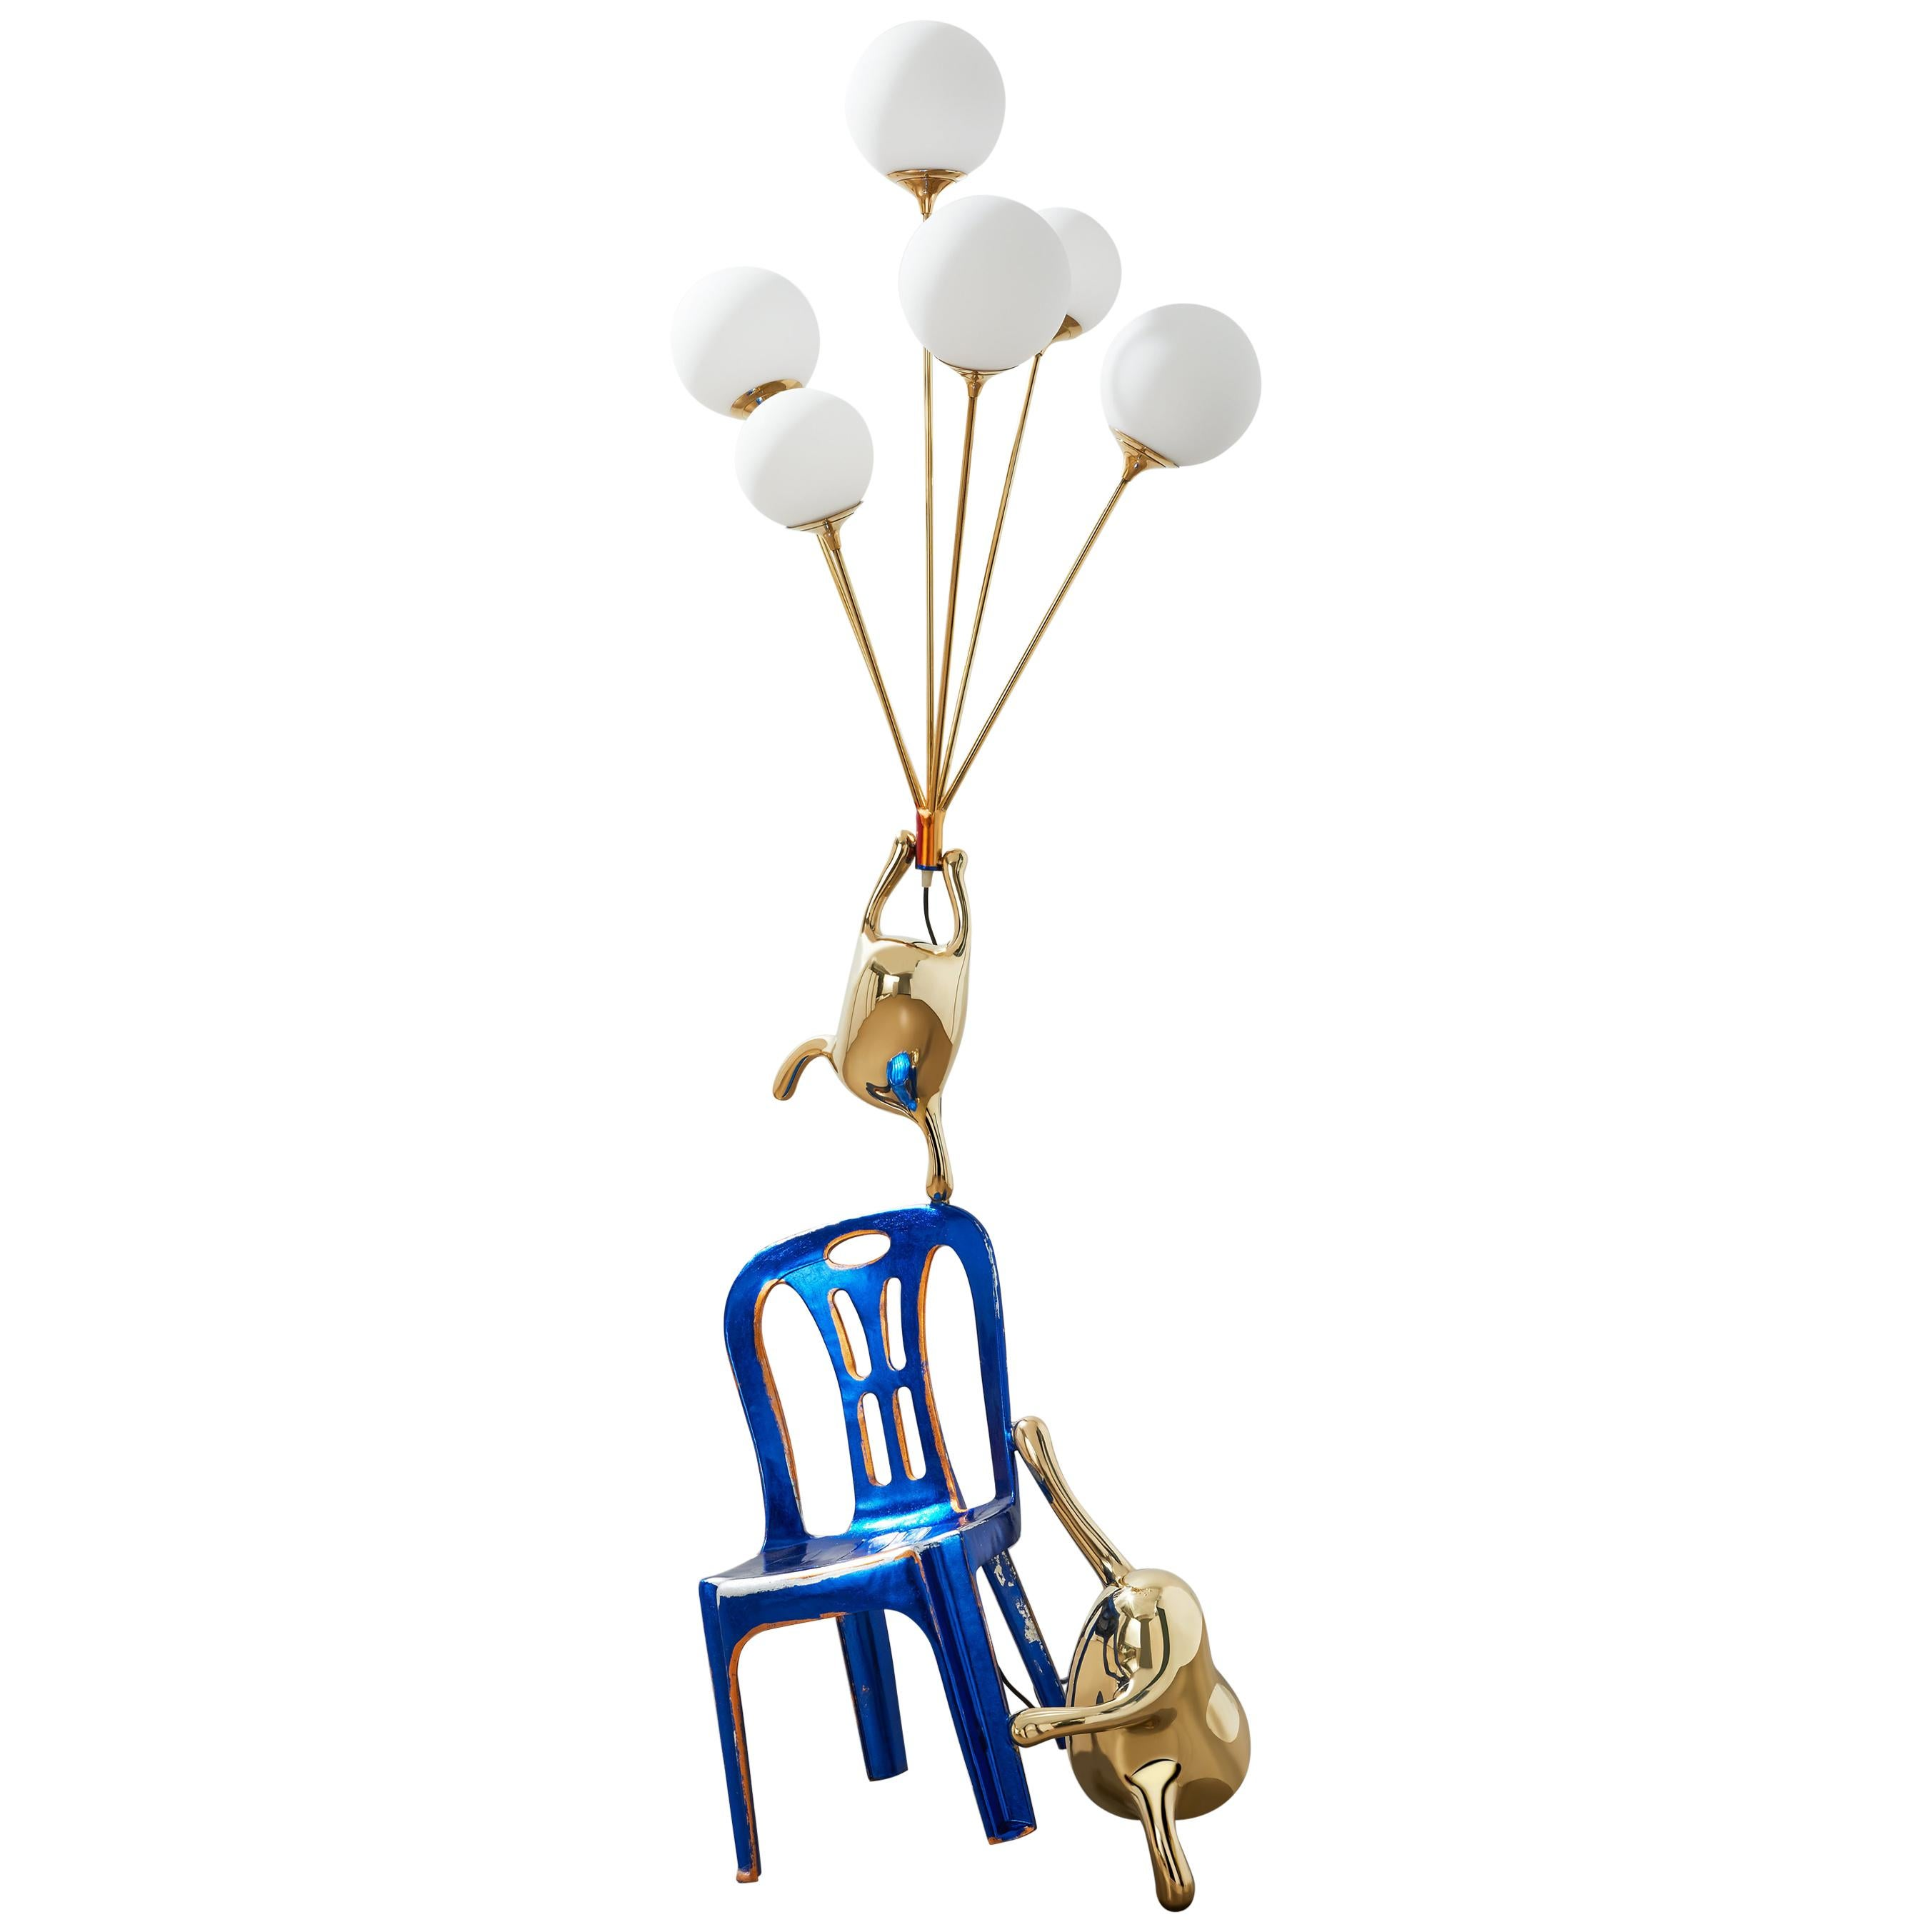 Zhipeng Tan, Brass Floor Lamp, 'Up,' TanTan Collection